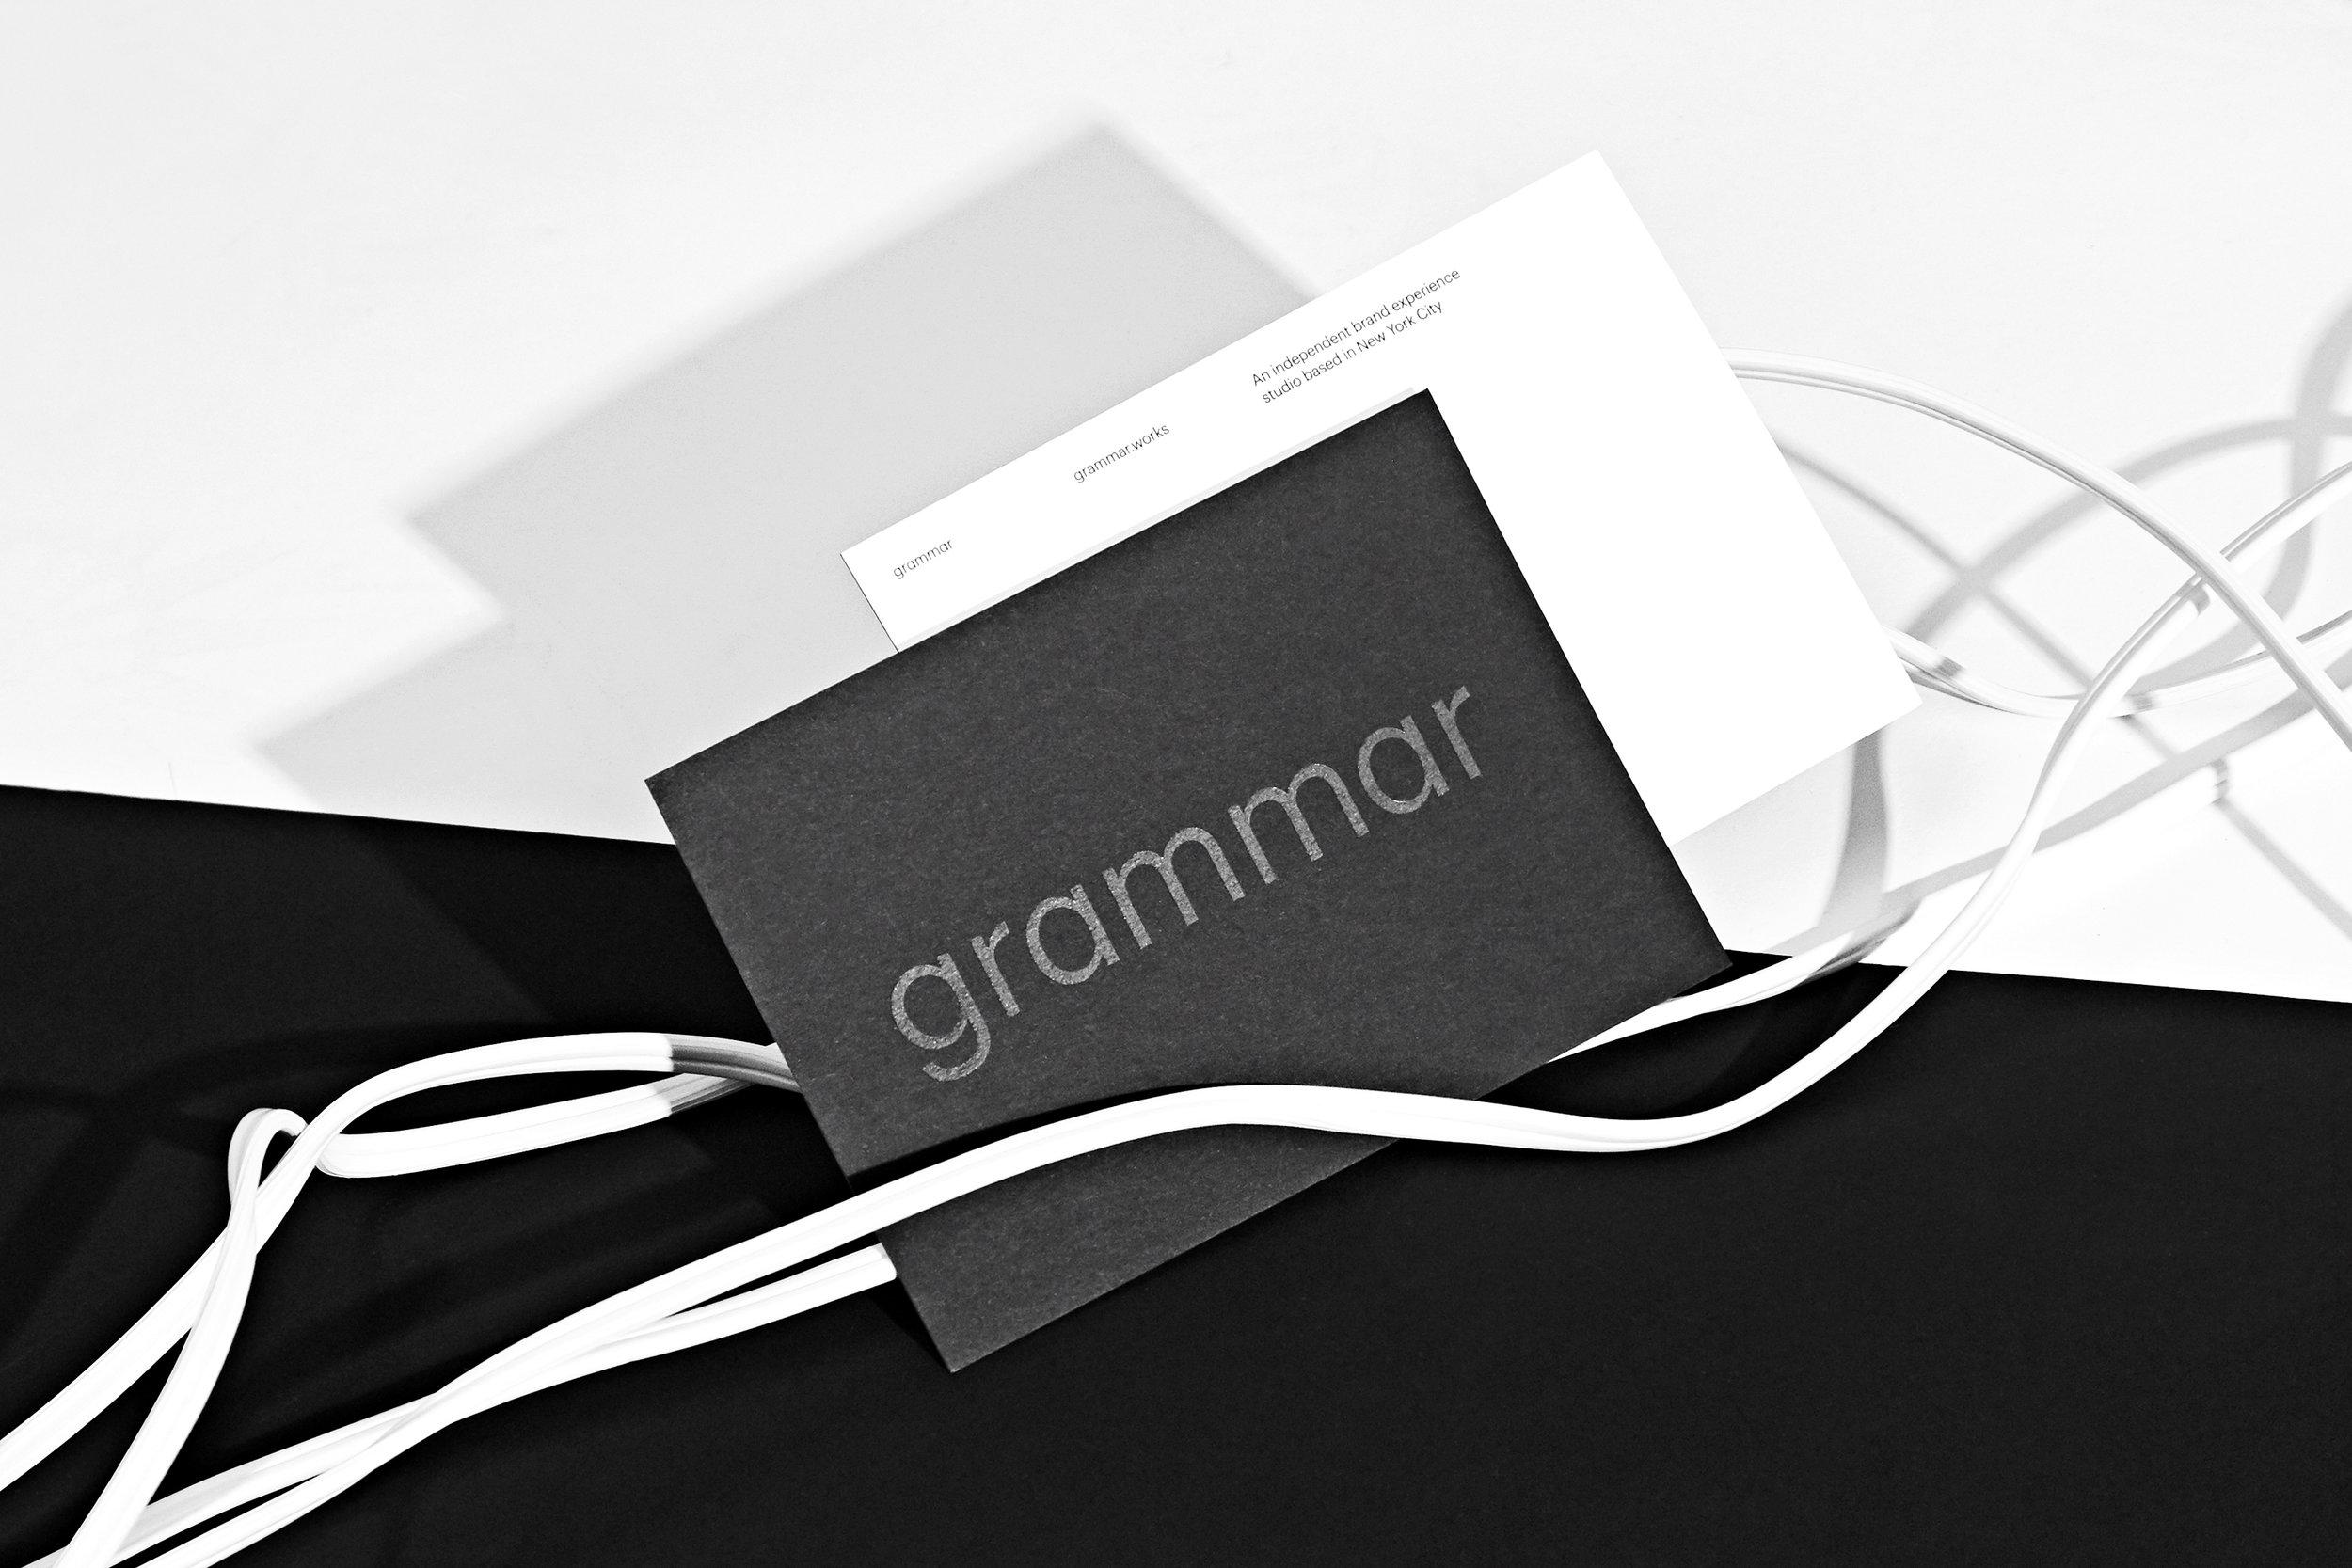 07_Grammar_Identity_Studio_Postcard2_010819.jpg